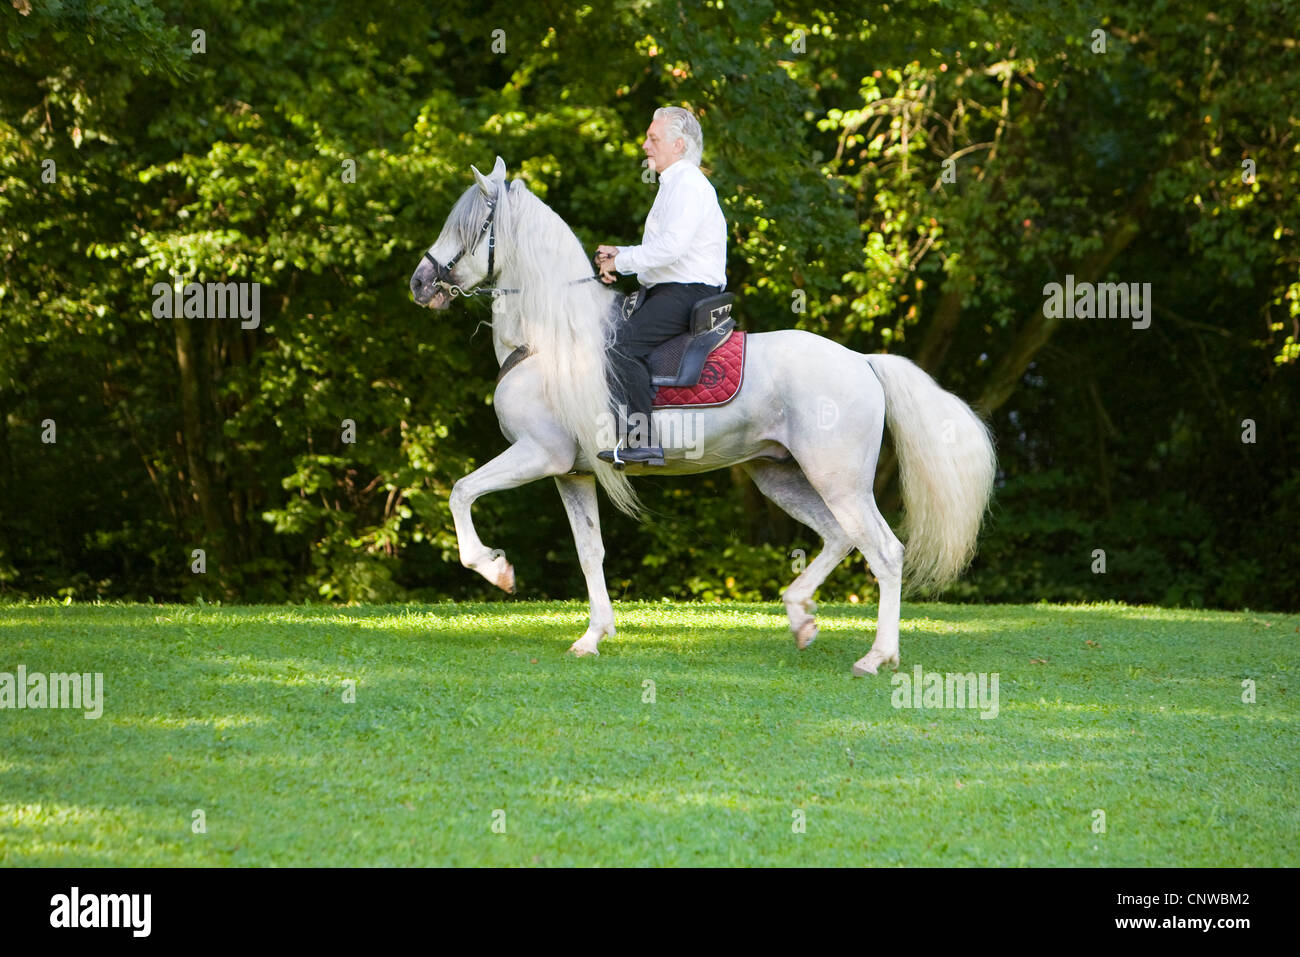 HORSE RIDING | WHITE HORSE RIDING ON ROAD - YouTube |Ride The White Horse